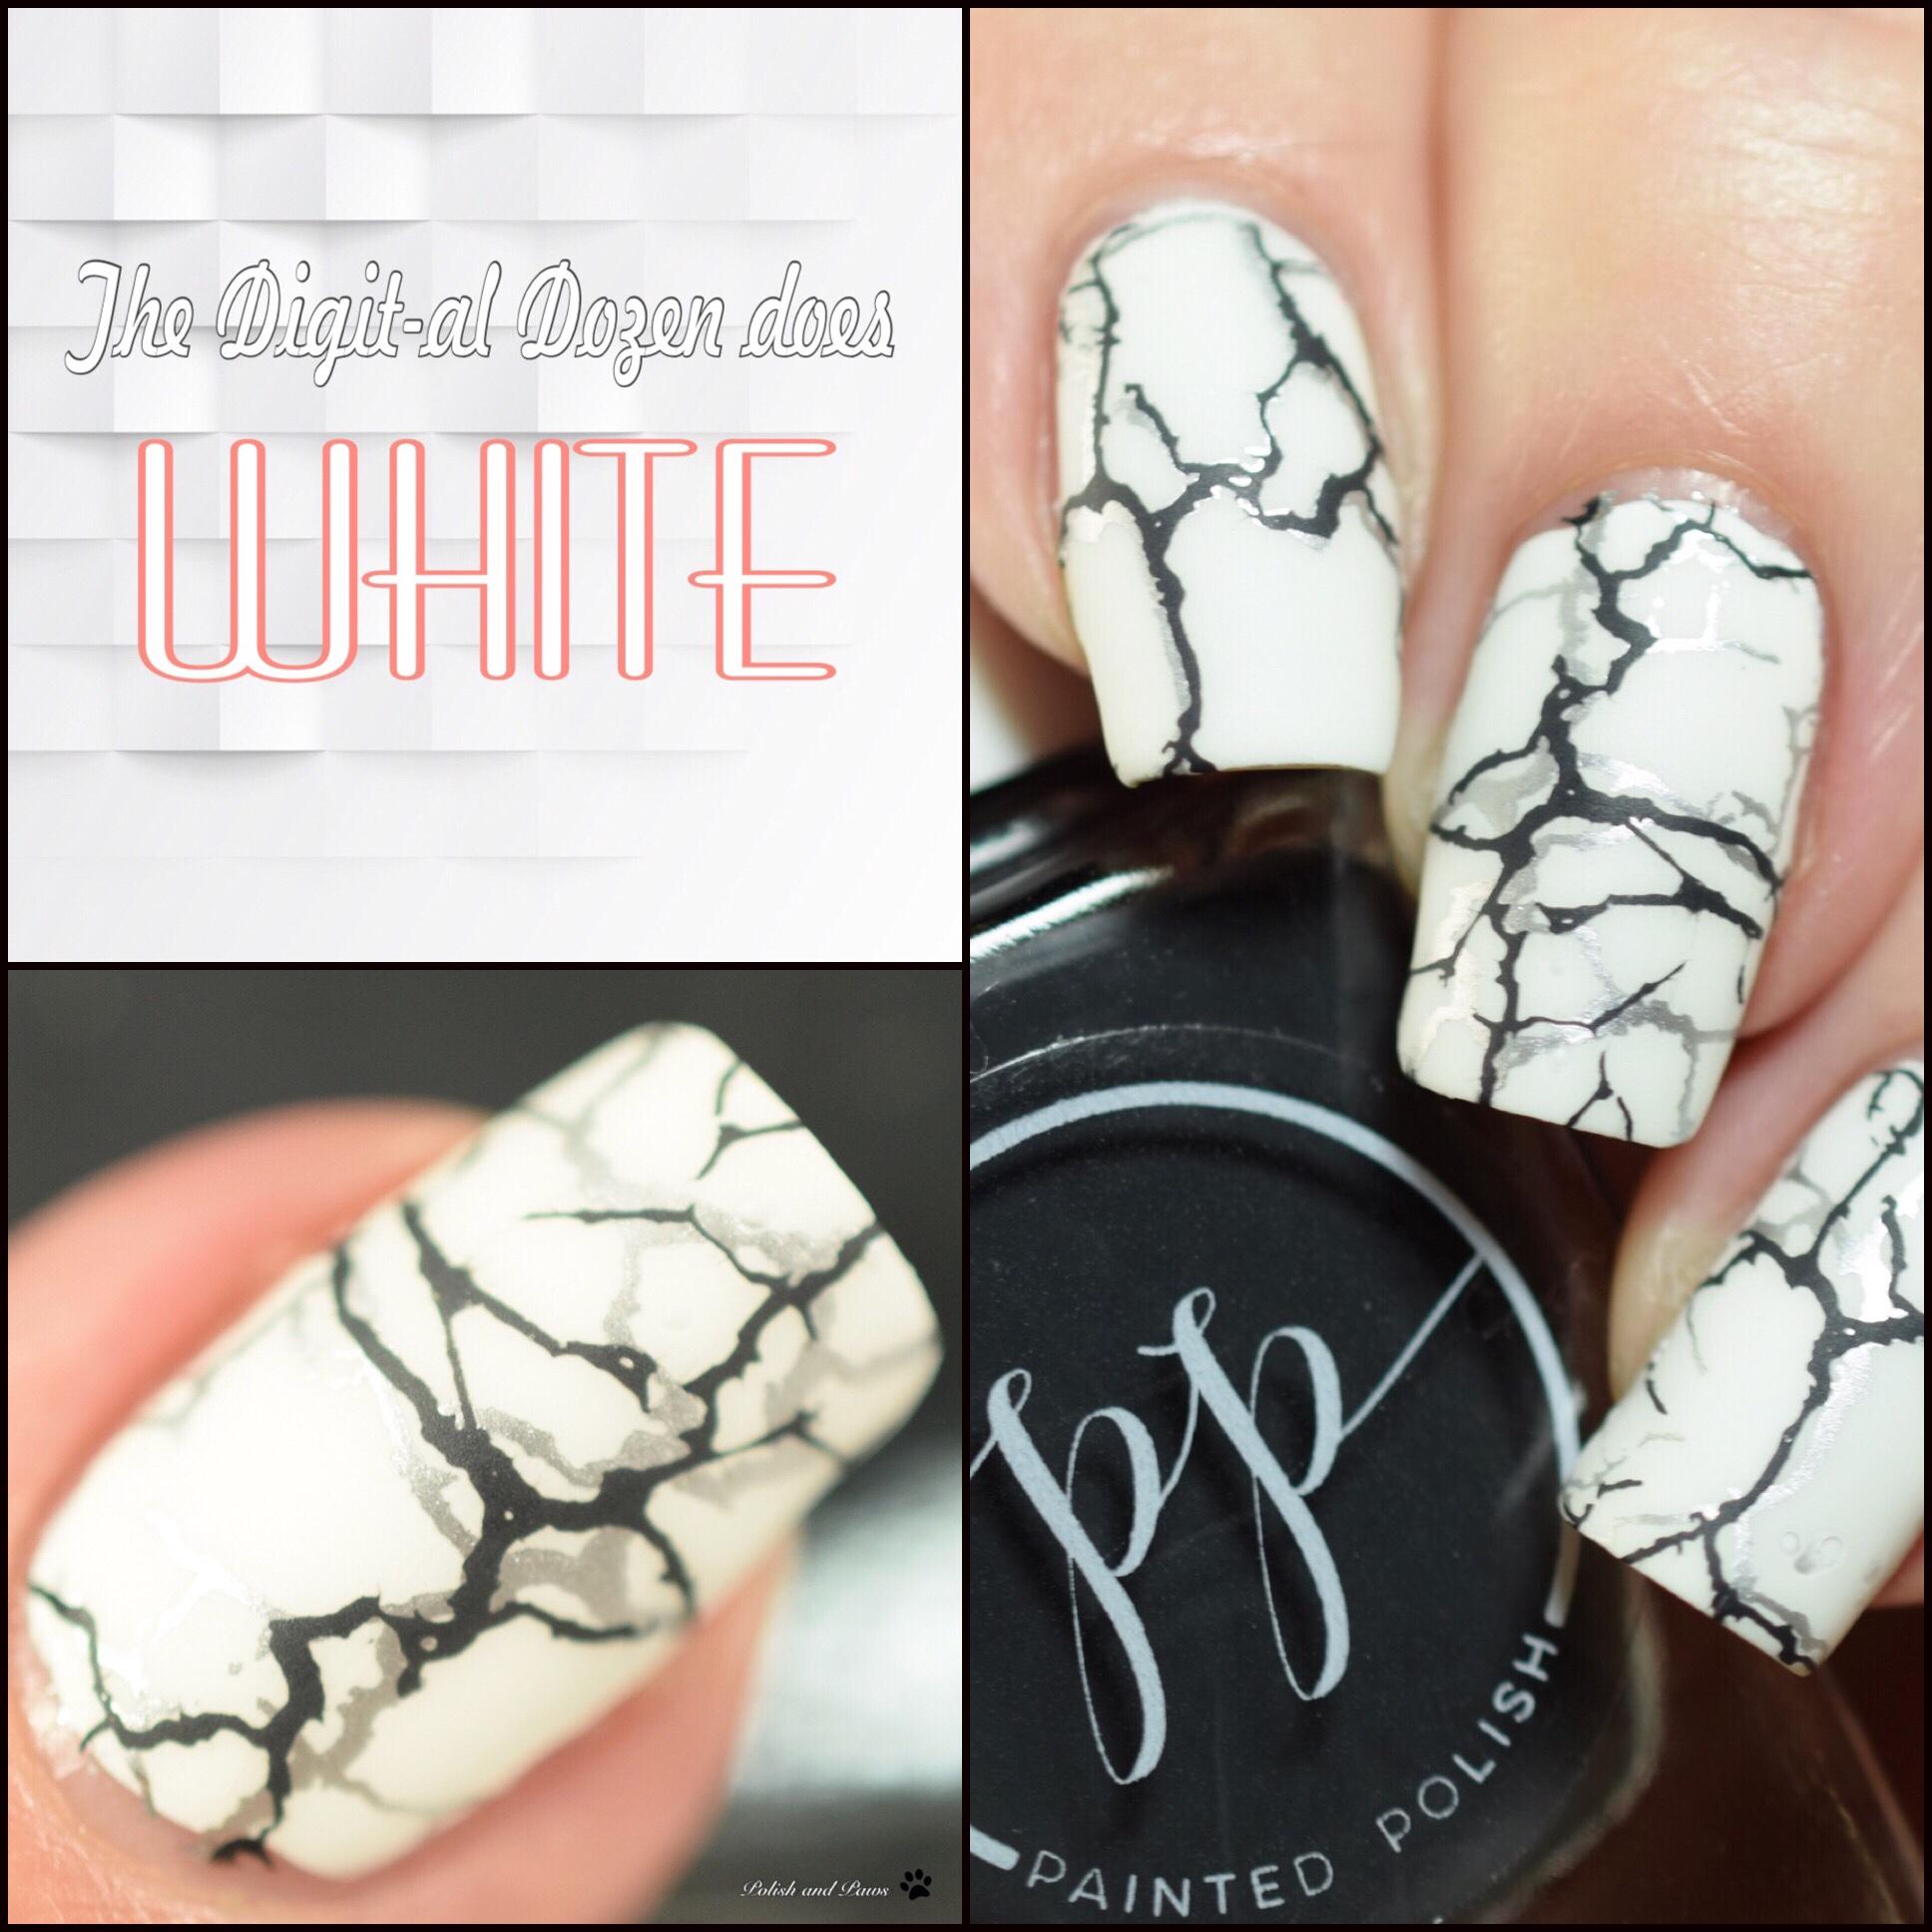 The Digit-al Dozen does White: Marble Nails